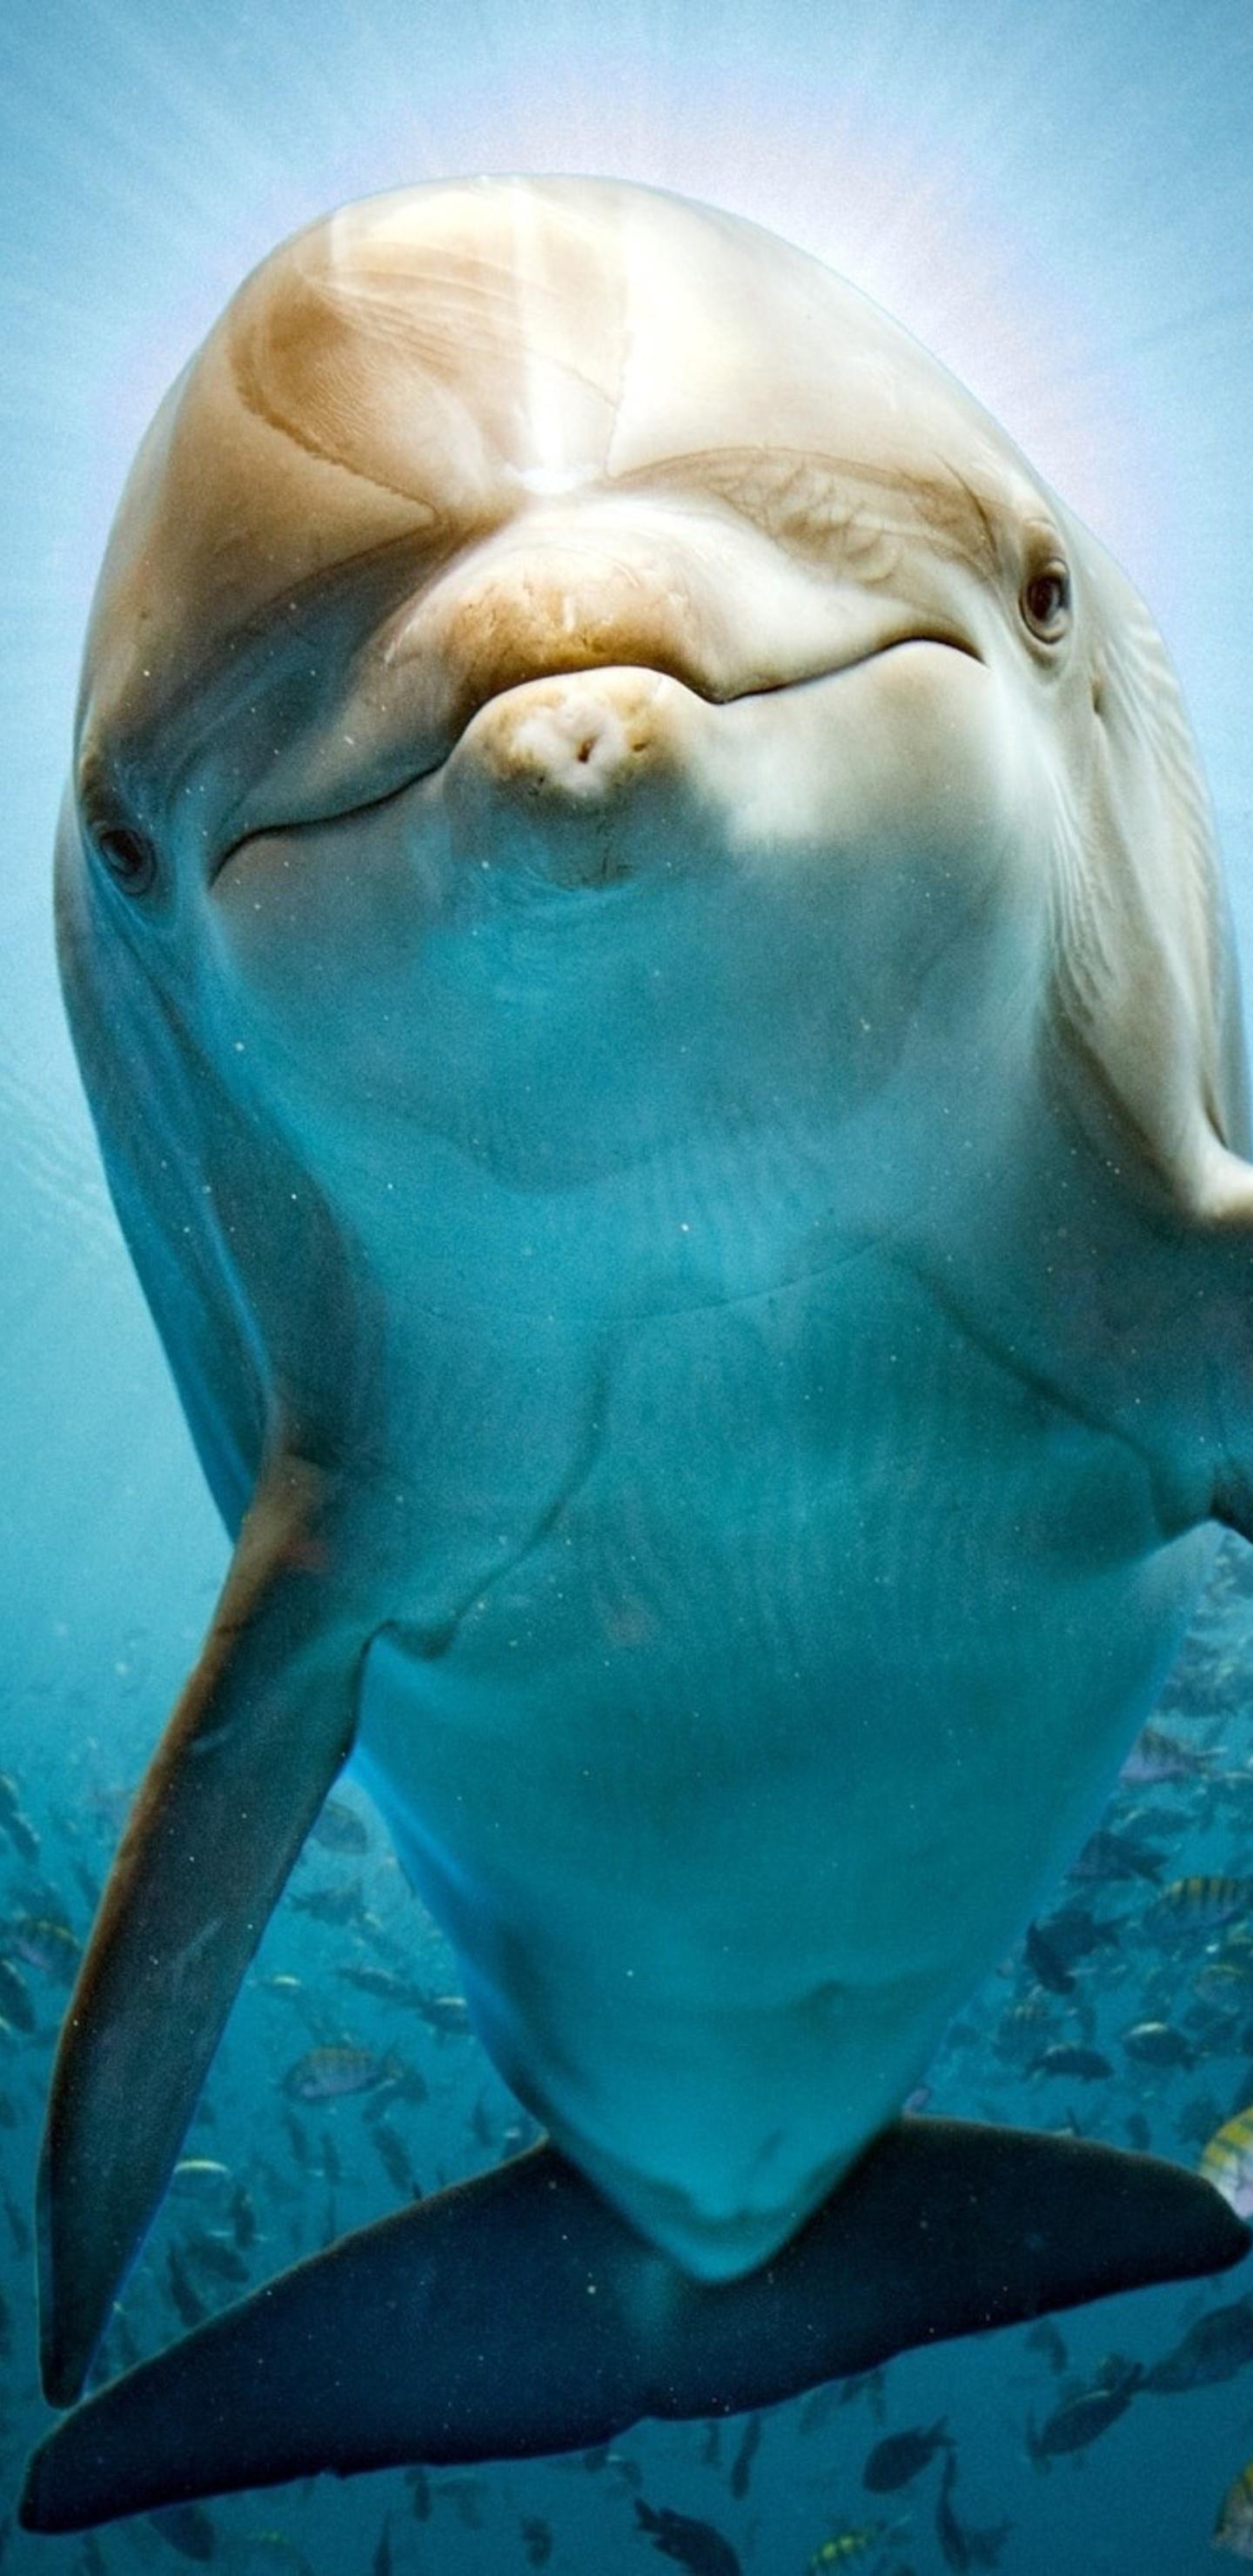 1440x2960 Dolphin Hd Samsung Galaxy Note 98 S9s8s8 Qhd Hd 4k